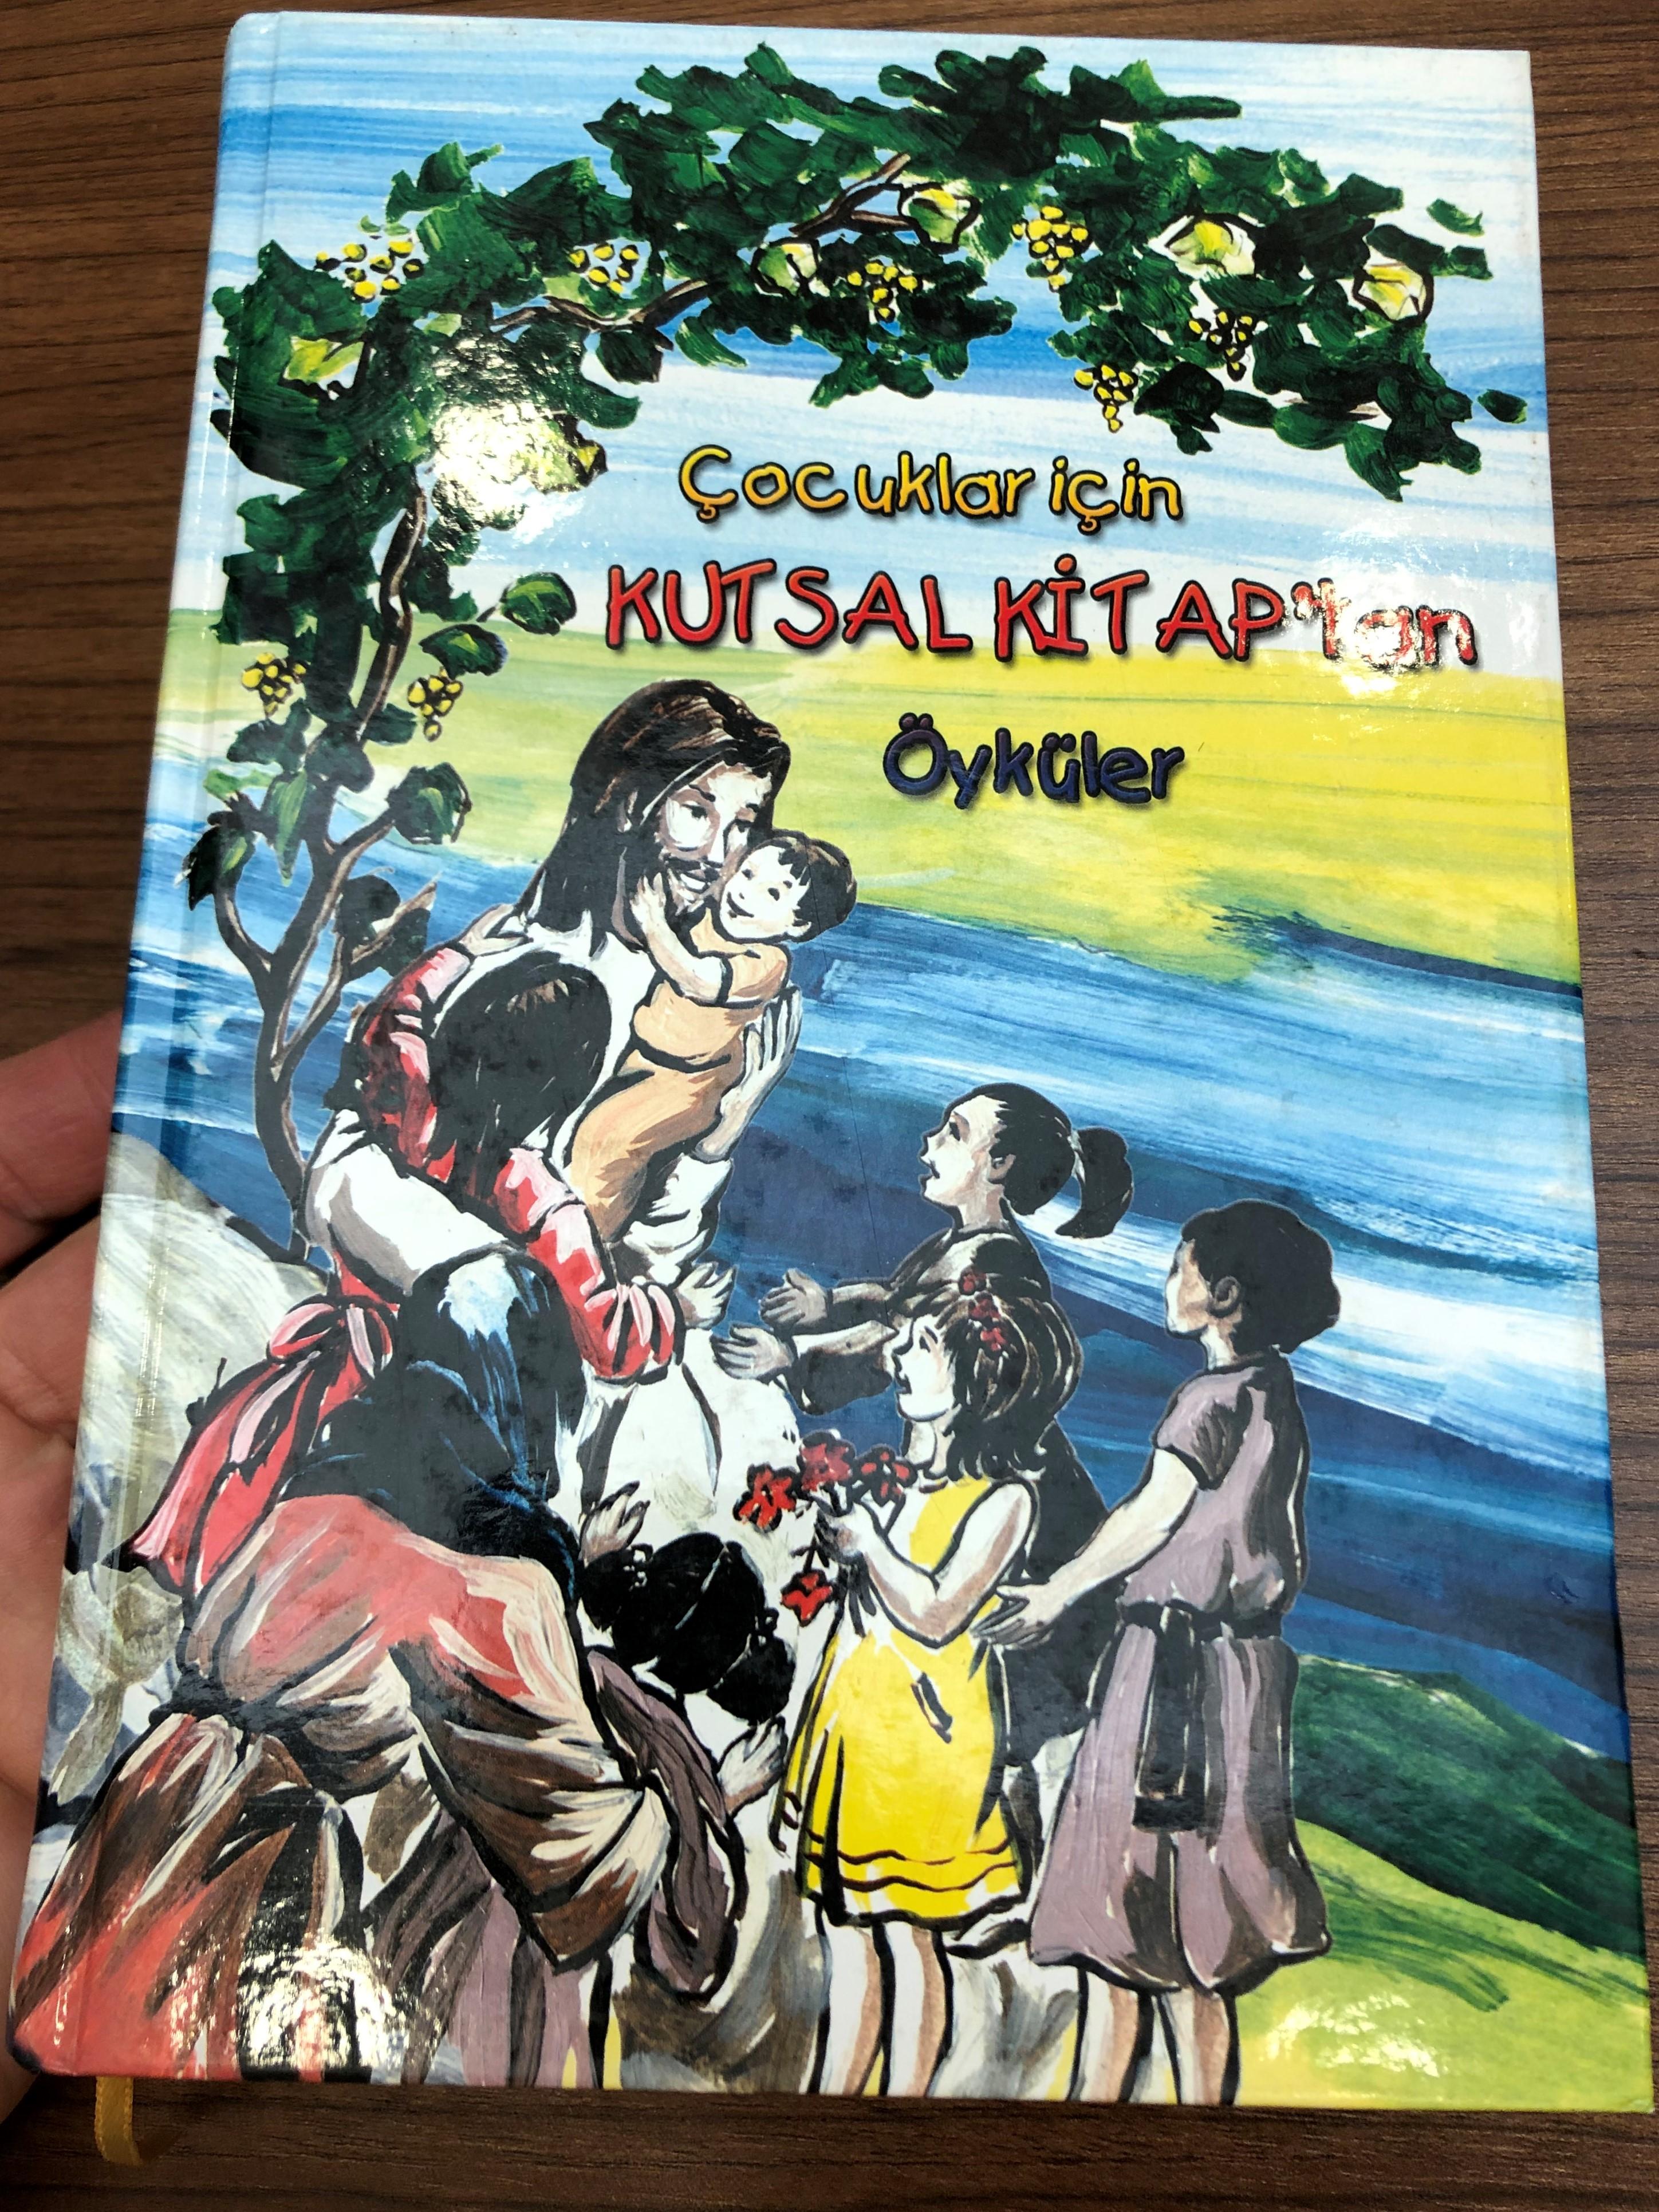 -ocuklar-i-in-kutsal-kitap-tan-yk-ler-yazan-soner-tufan-bible-stories-for-children-in-turkish-1-.jpg